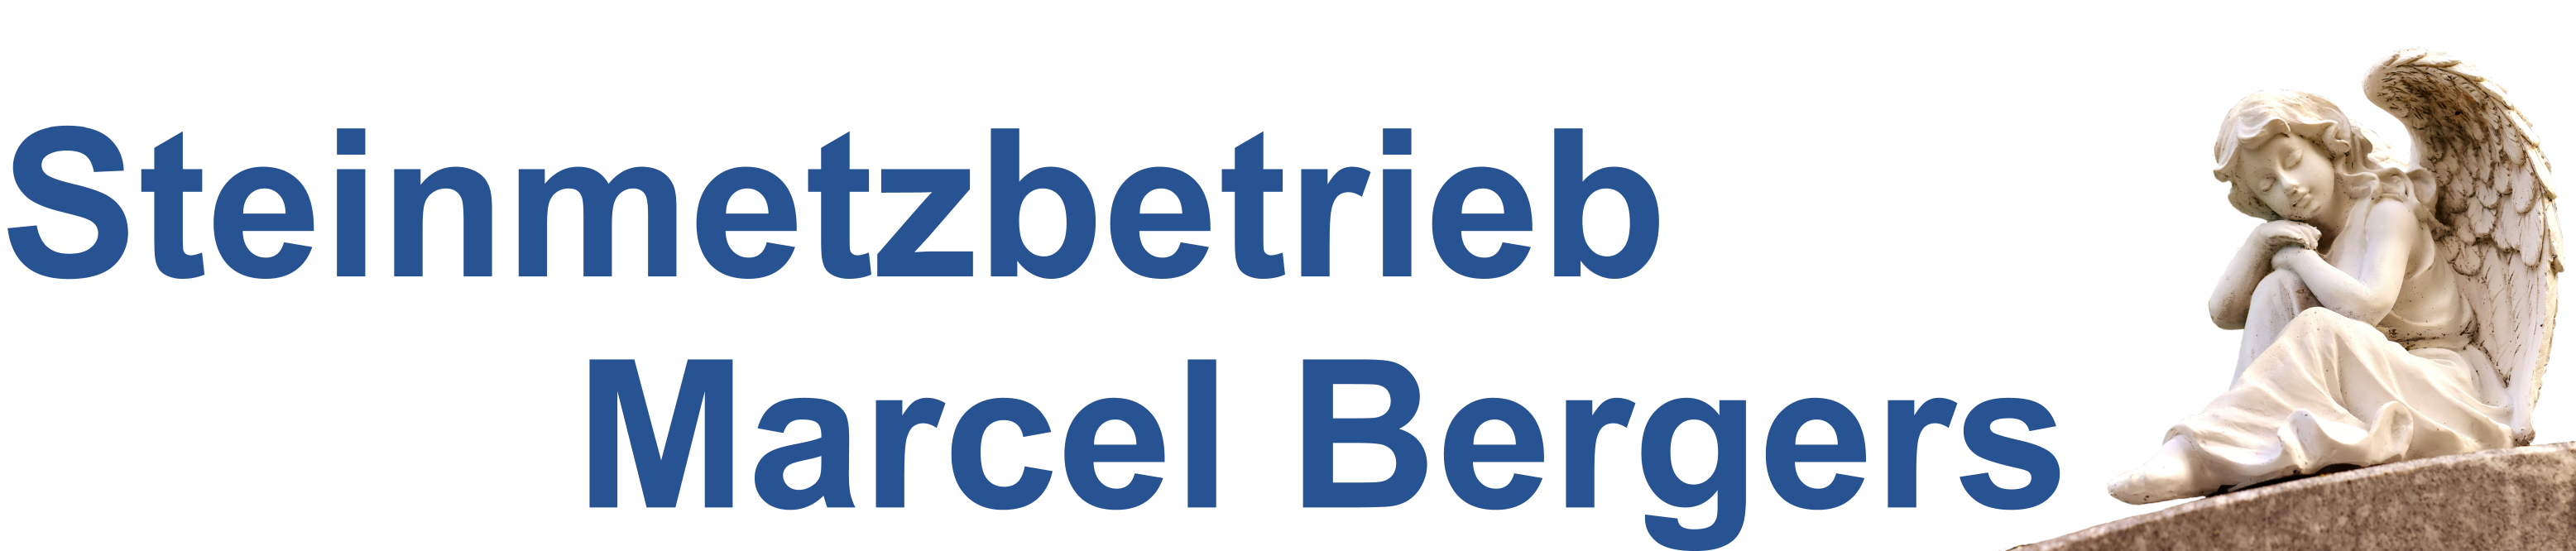 Steinmetzbetrieb Bergers